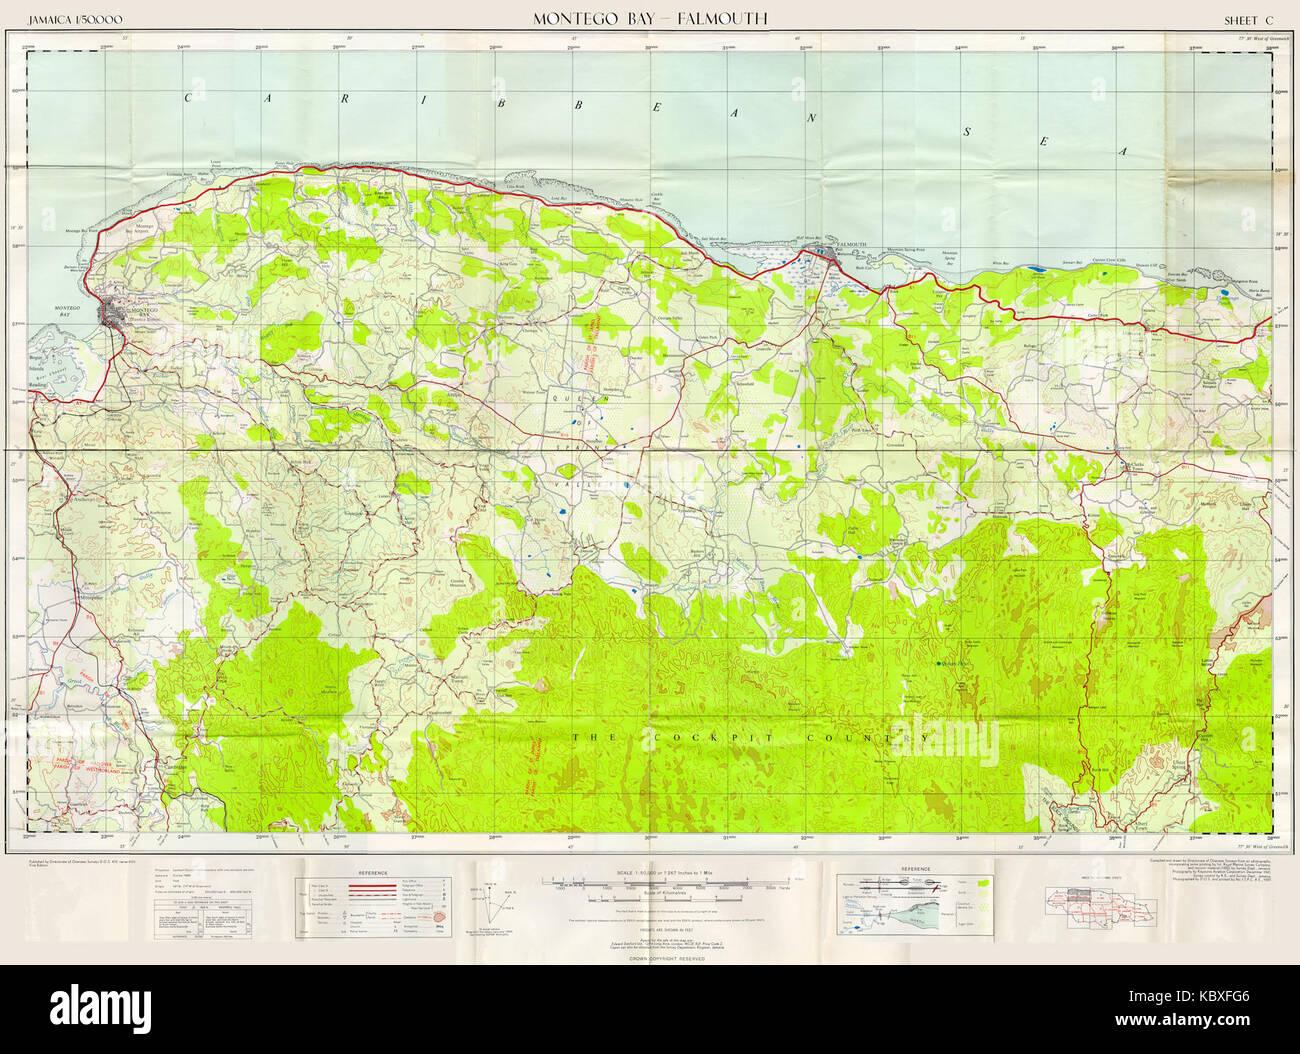 DoOS 1 to 50000 Map of Jamaica Sheet C (Montego Bay Falmouth) 1959 ...